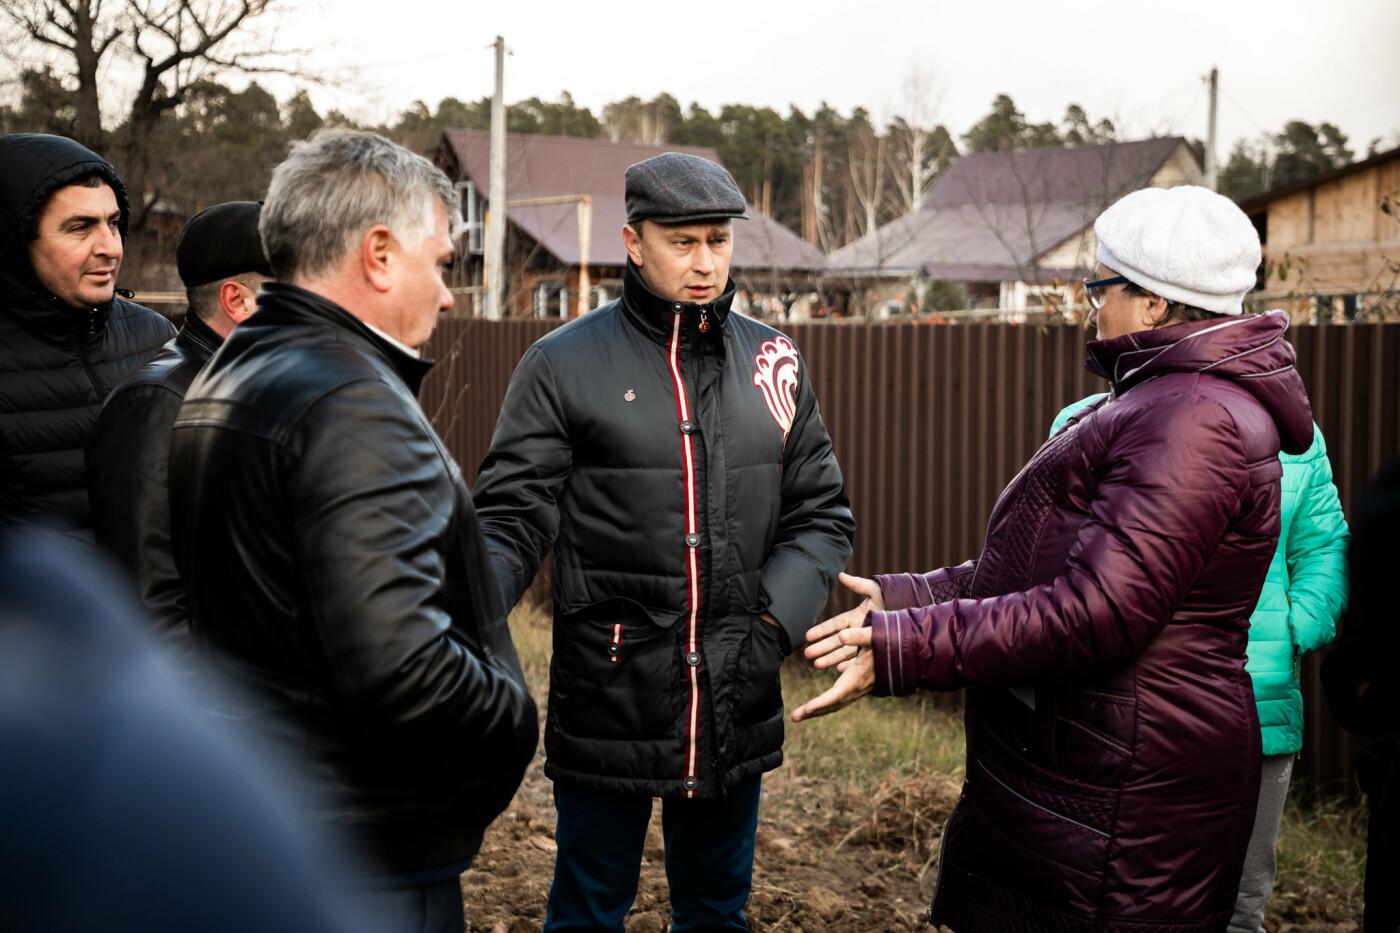 В пригороде Тамбова построили новую дорогу за 3,4 млн рублей, фото-7